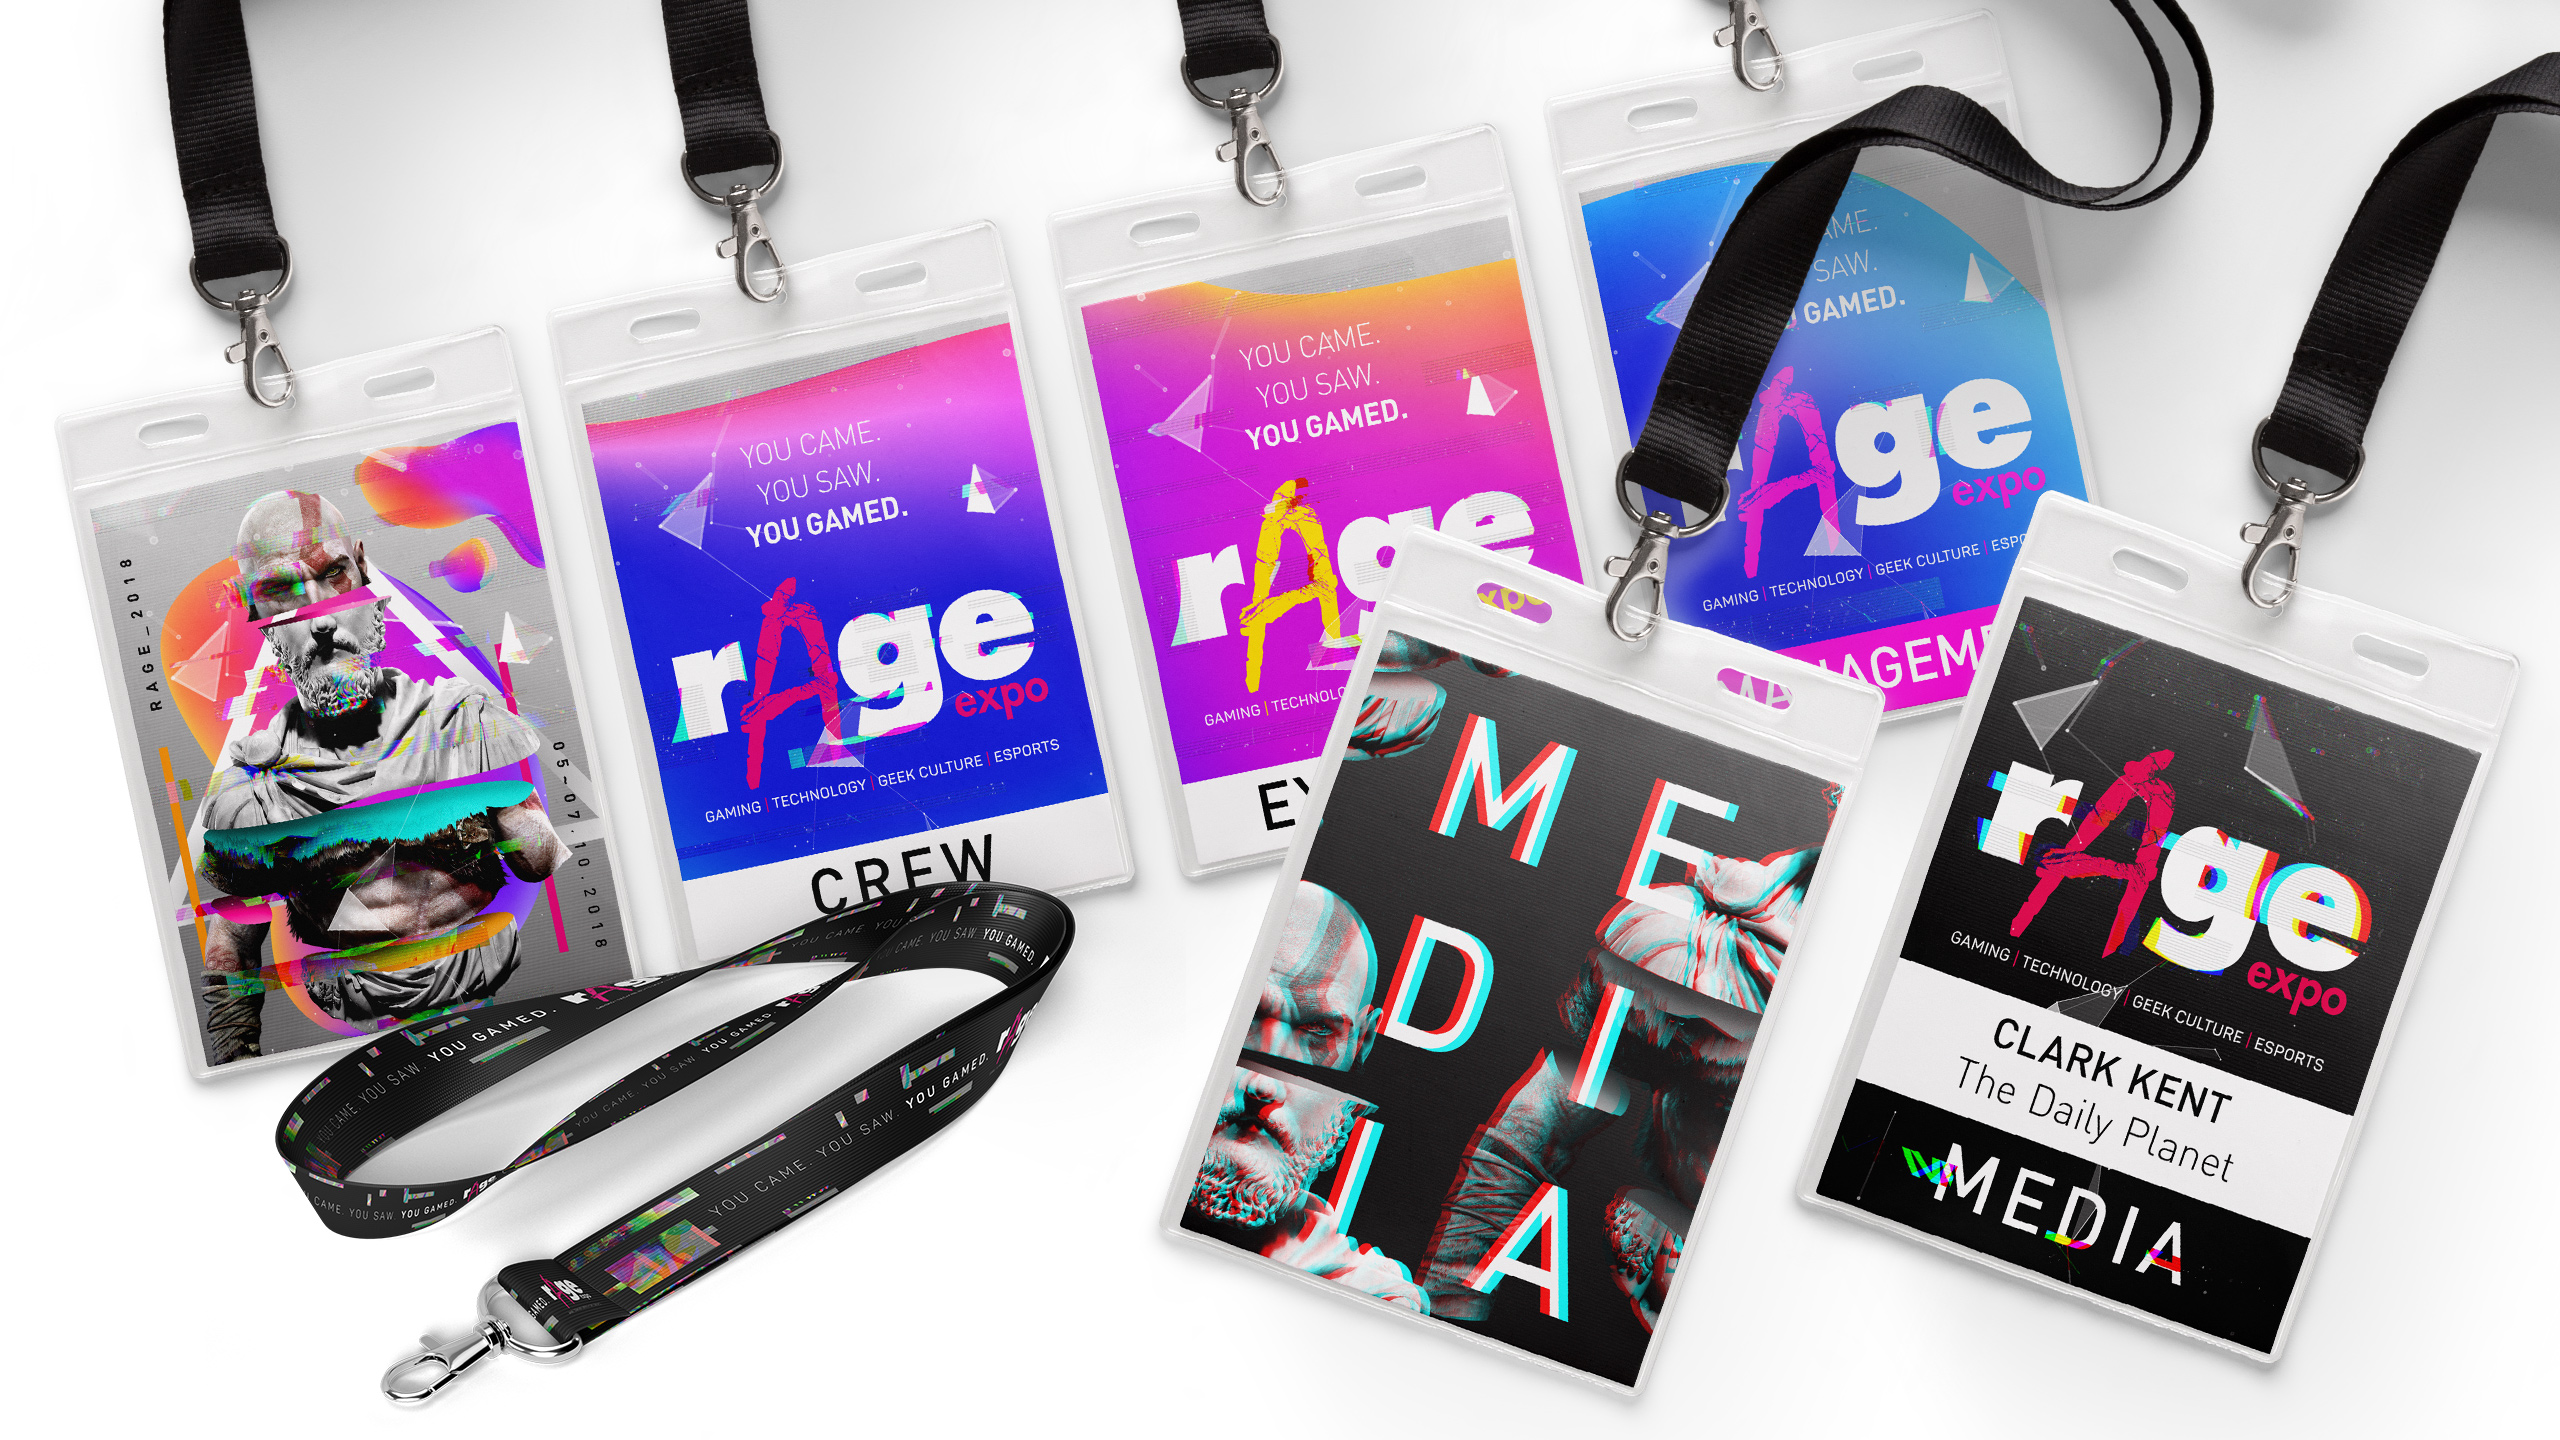 rAge Expo badge designs